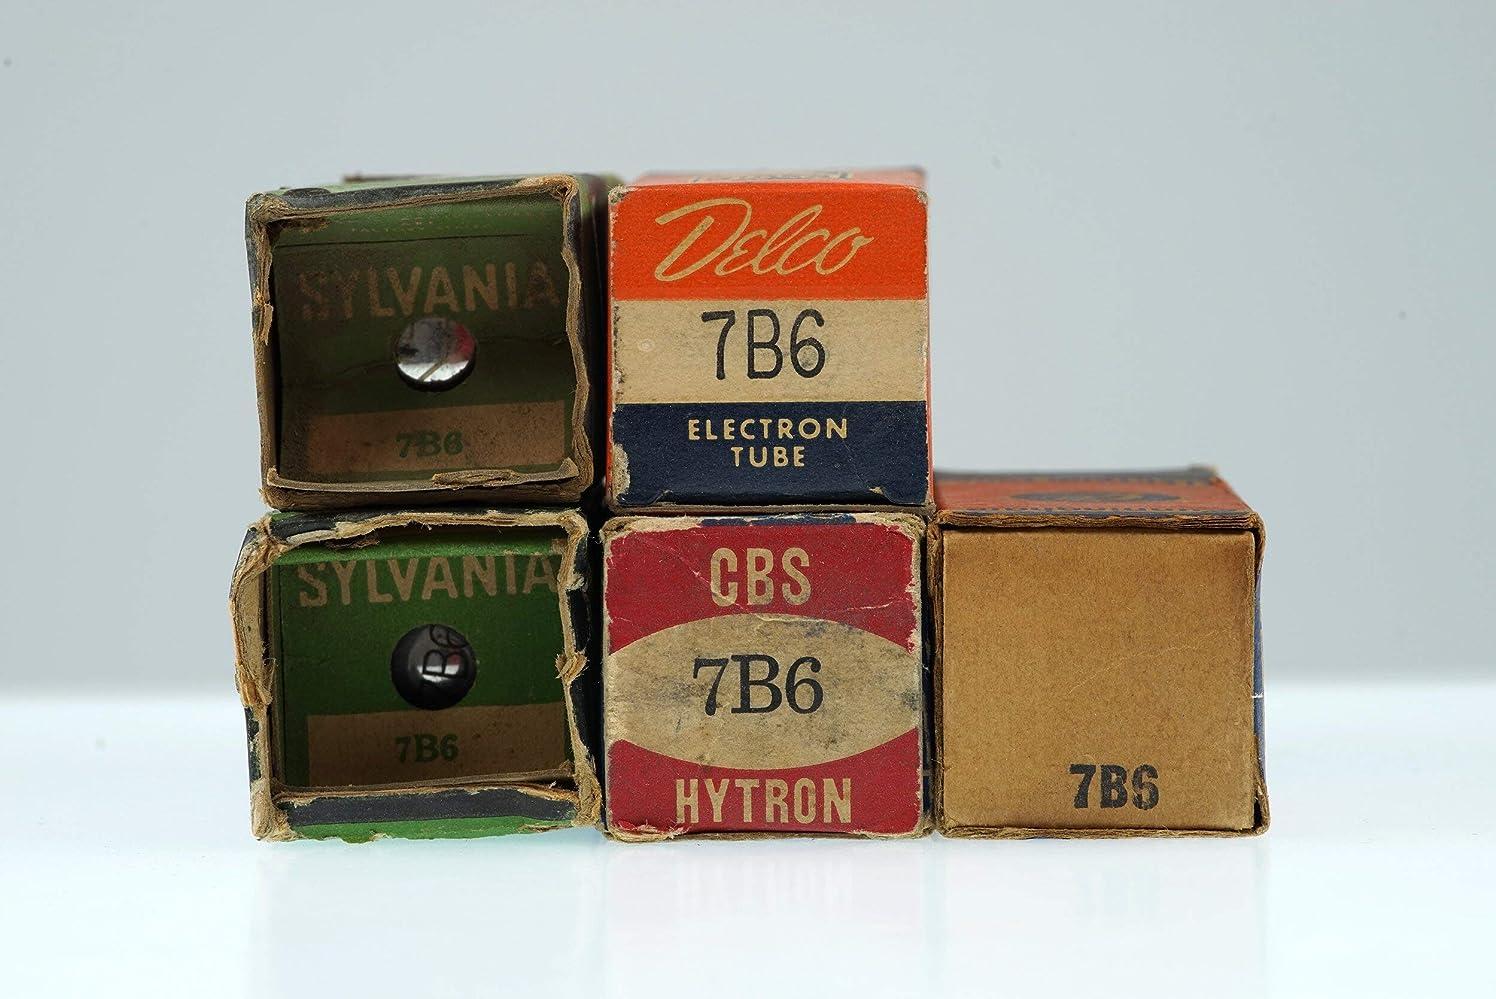 5 Vintage 7B6 Loctal Twin Diode Triode Audio Frequency Radio/TV Valve - BangyBang Tubes